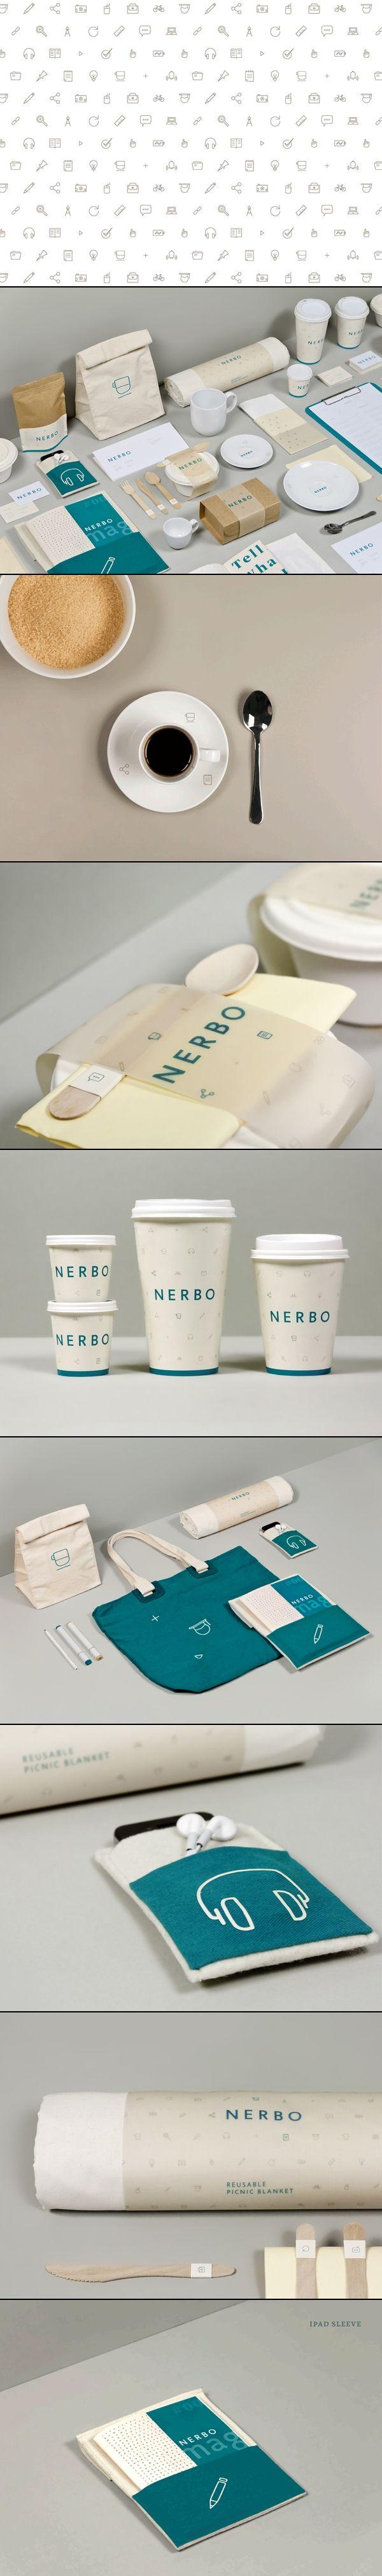 .Nerbo #identity #packaging #branding PD